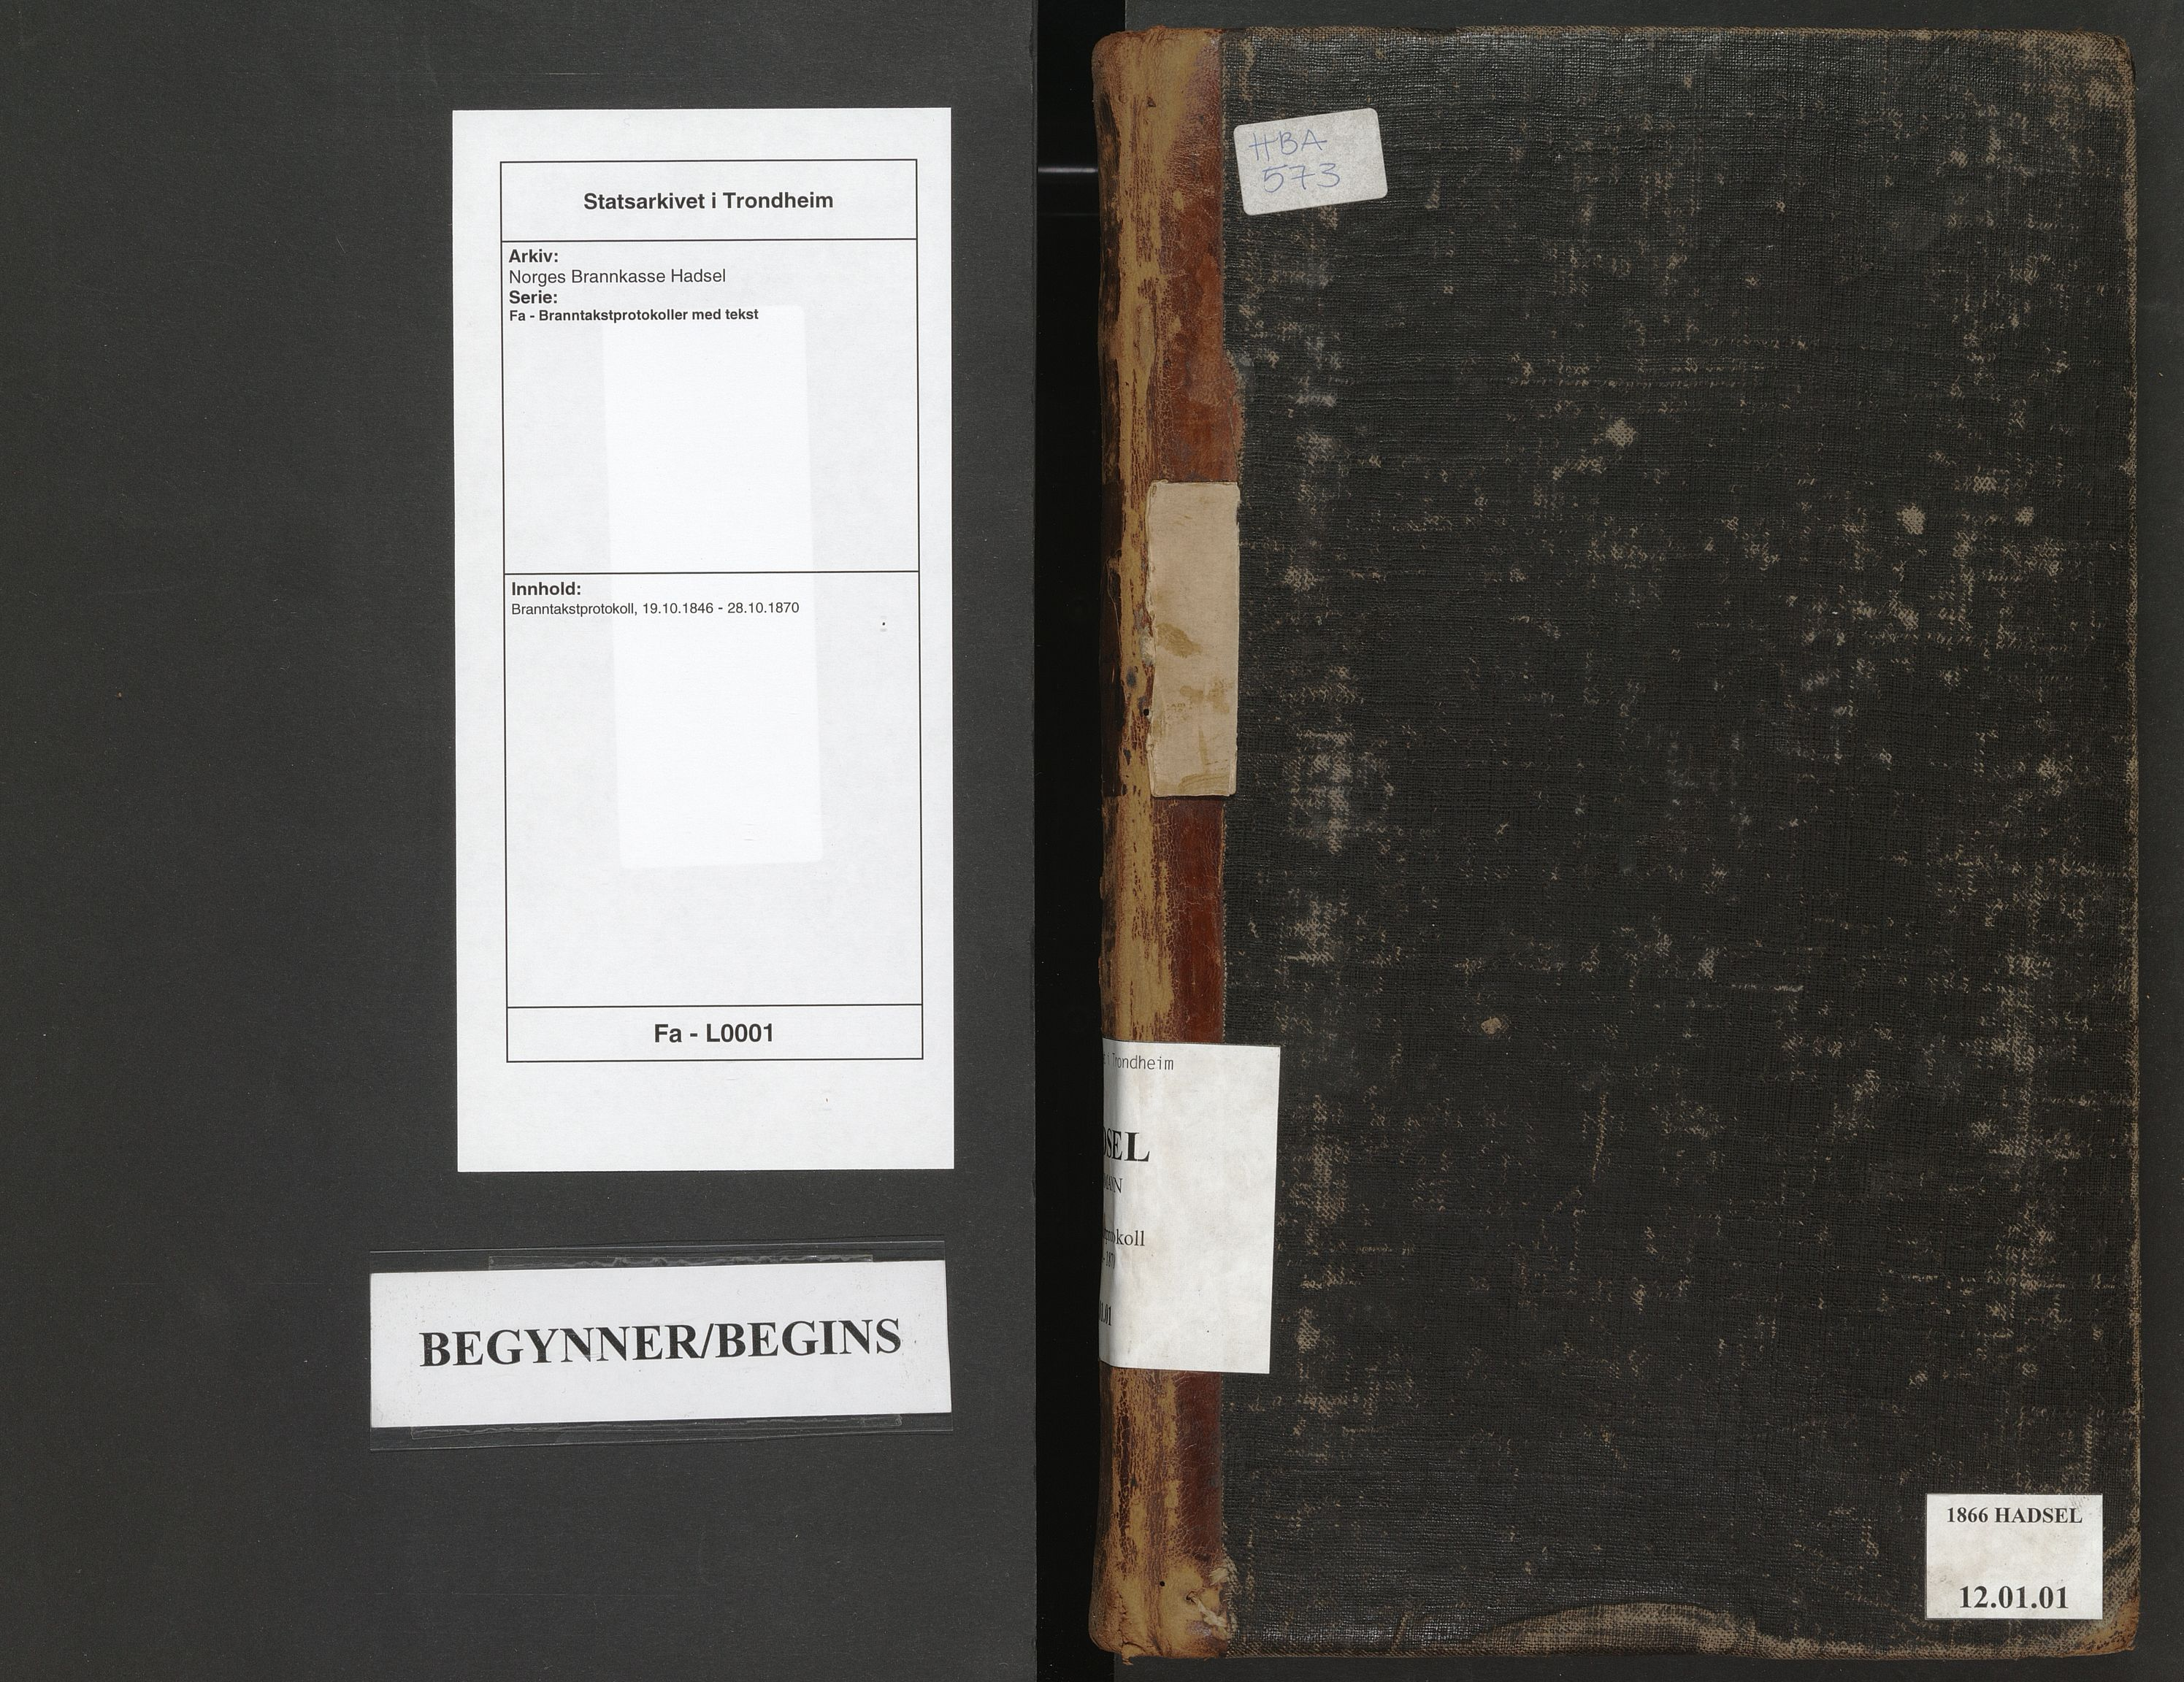 SAT, Norges Brannkasse Hadsel, Fa/L0001: Branntakstprotokoll, 1846-1870